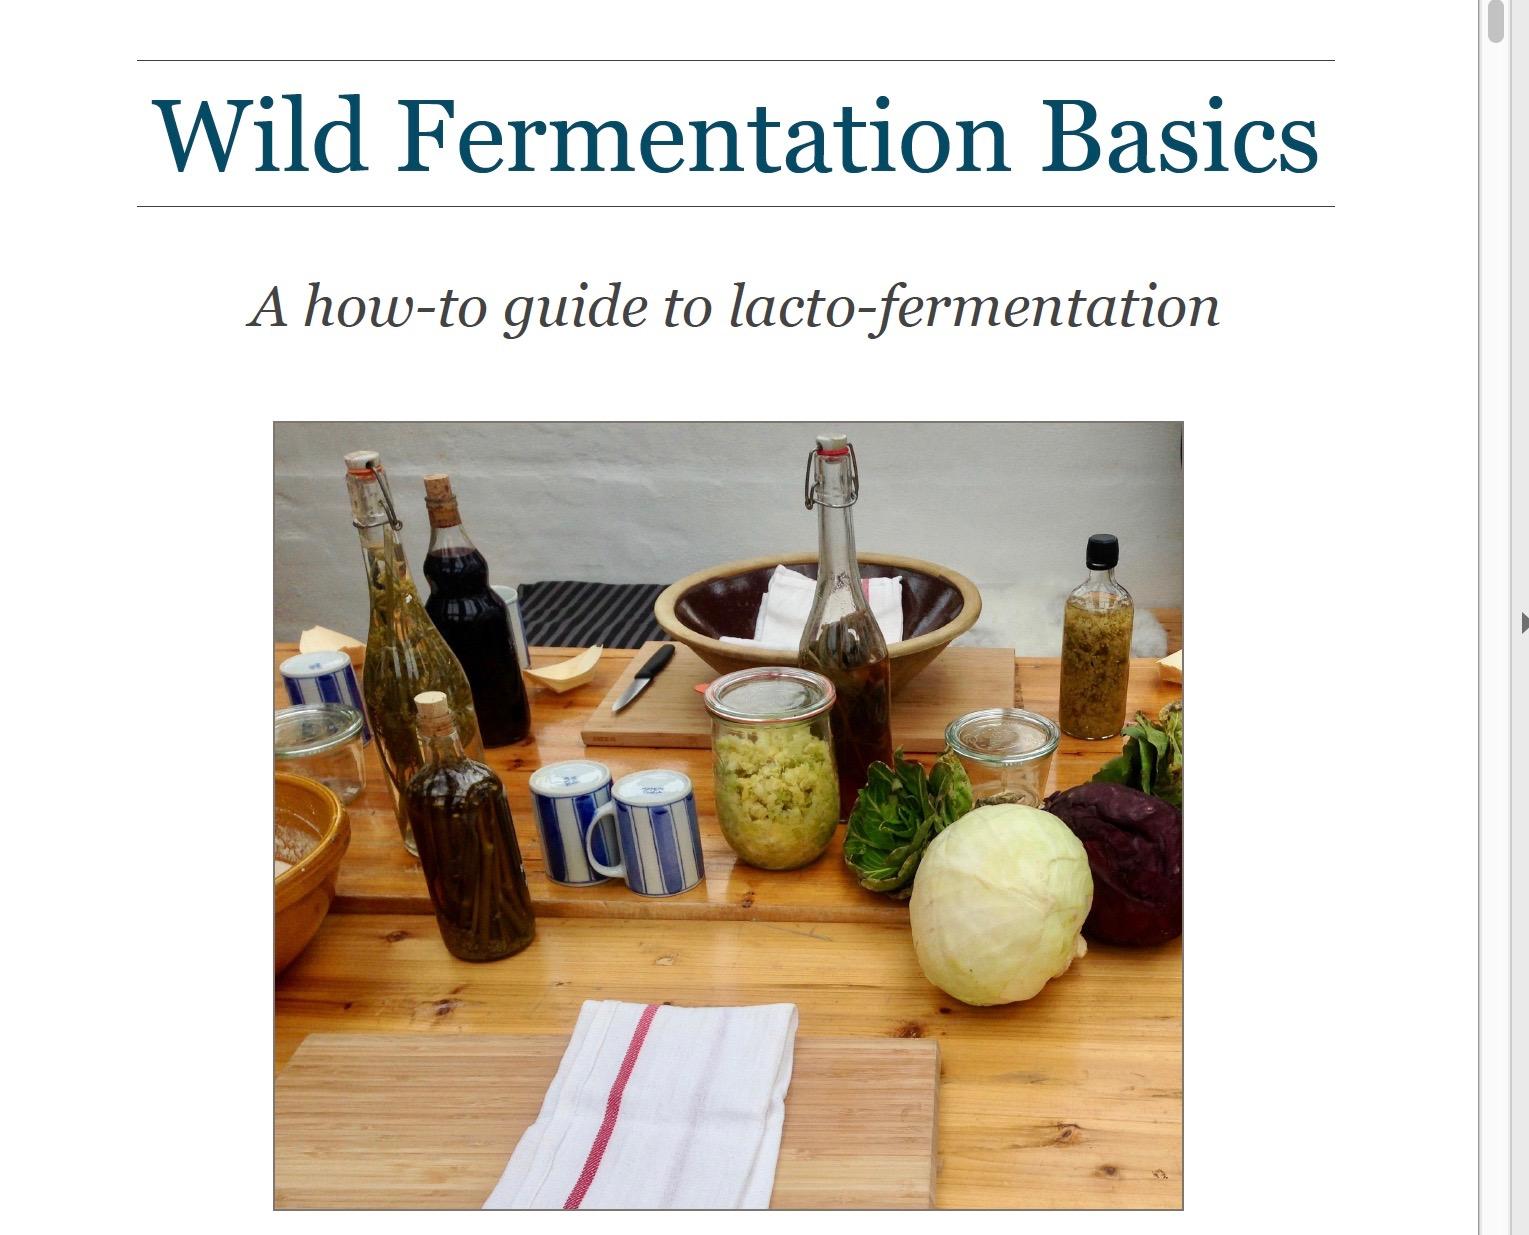 Wild Fermentation Ebook - Intro to Lacto-fermentation